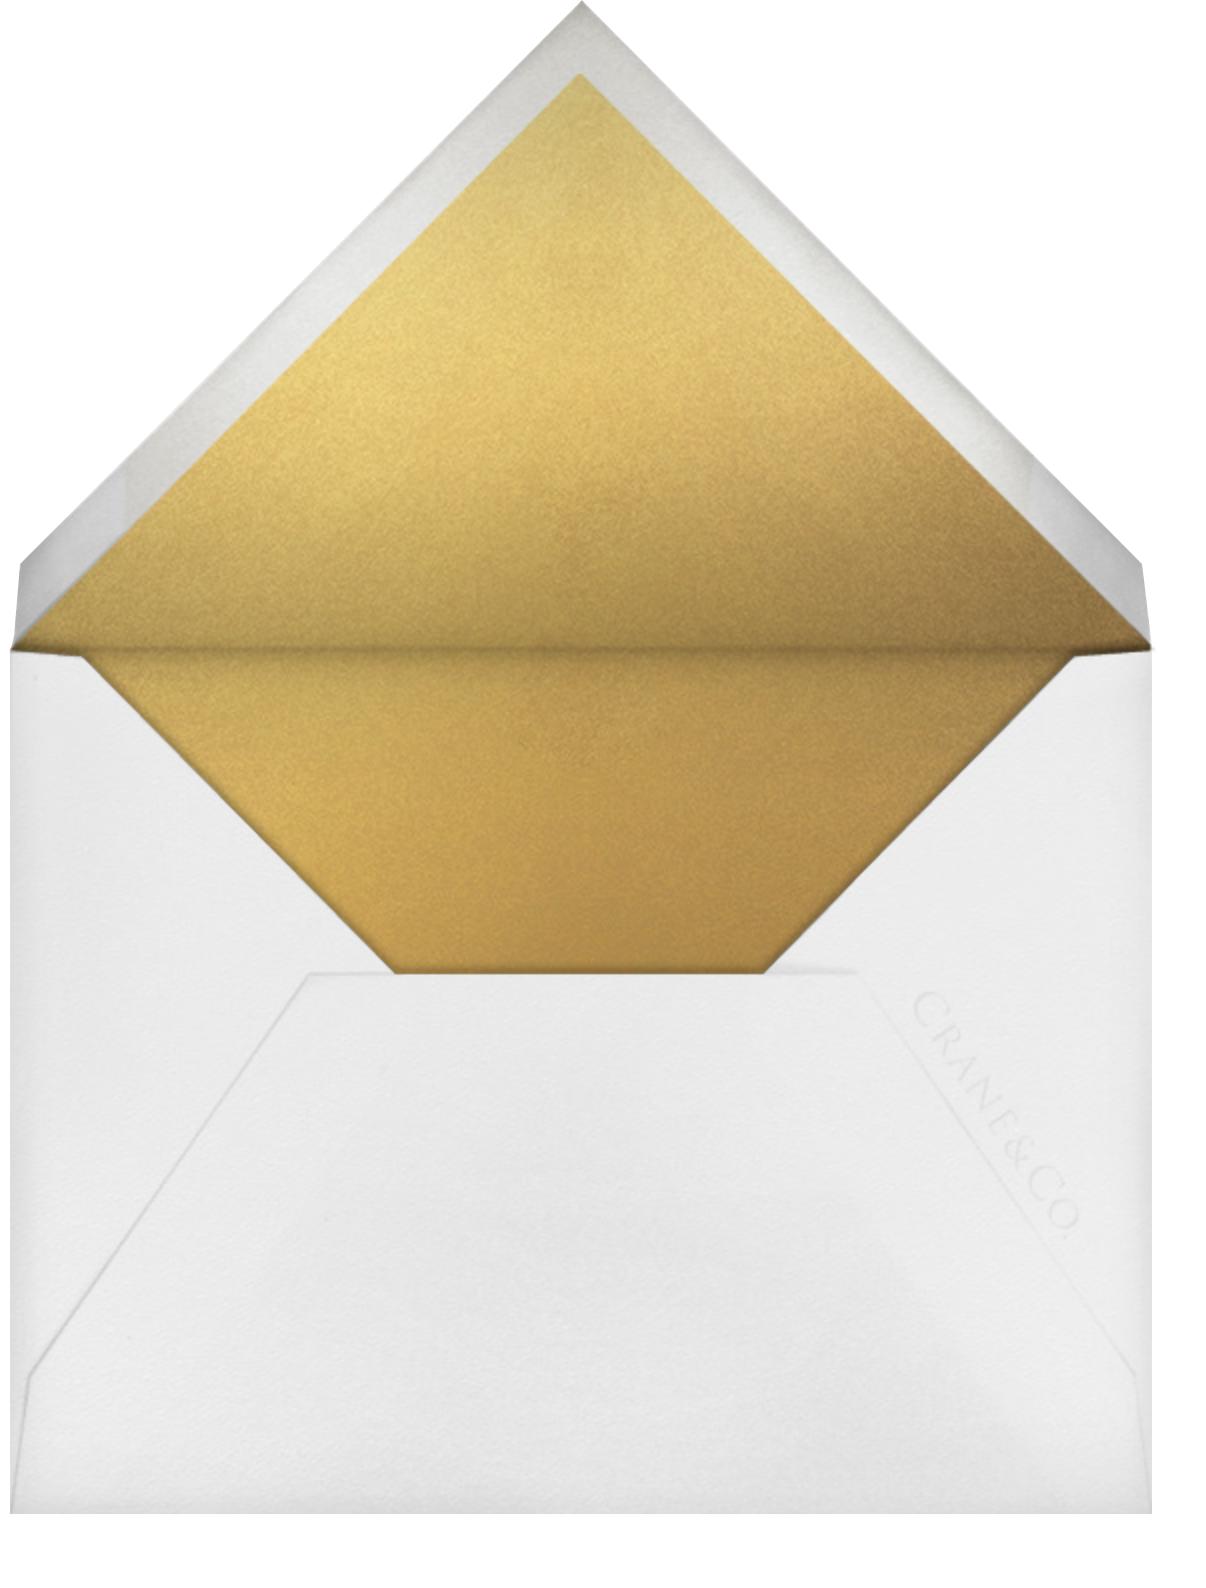 Polka Dot - Medium Gold - Oscar de la Renta - All - envelope back